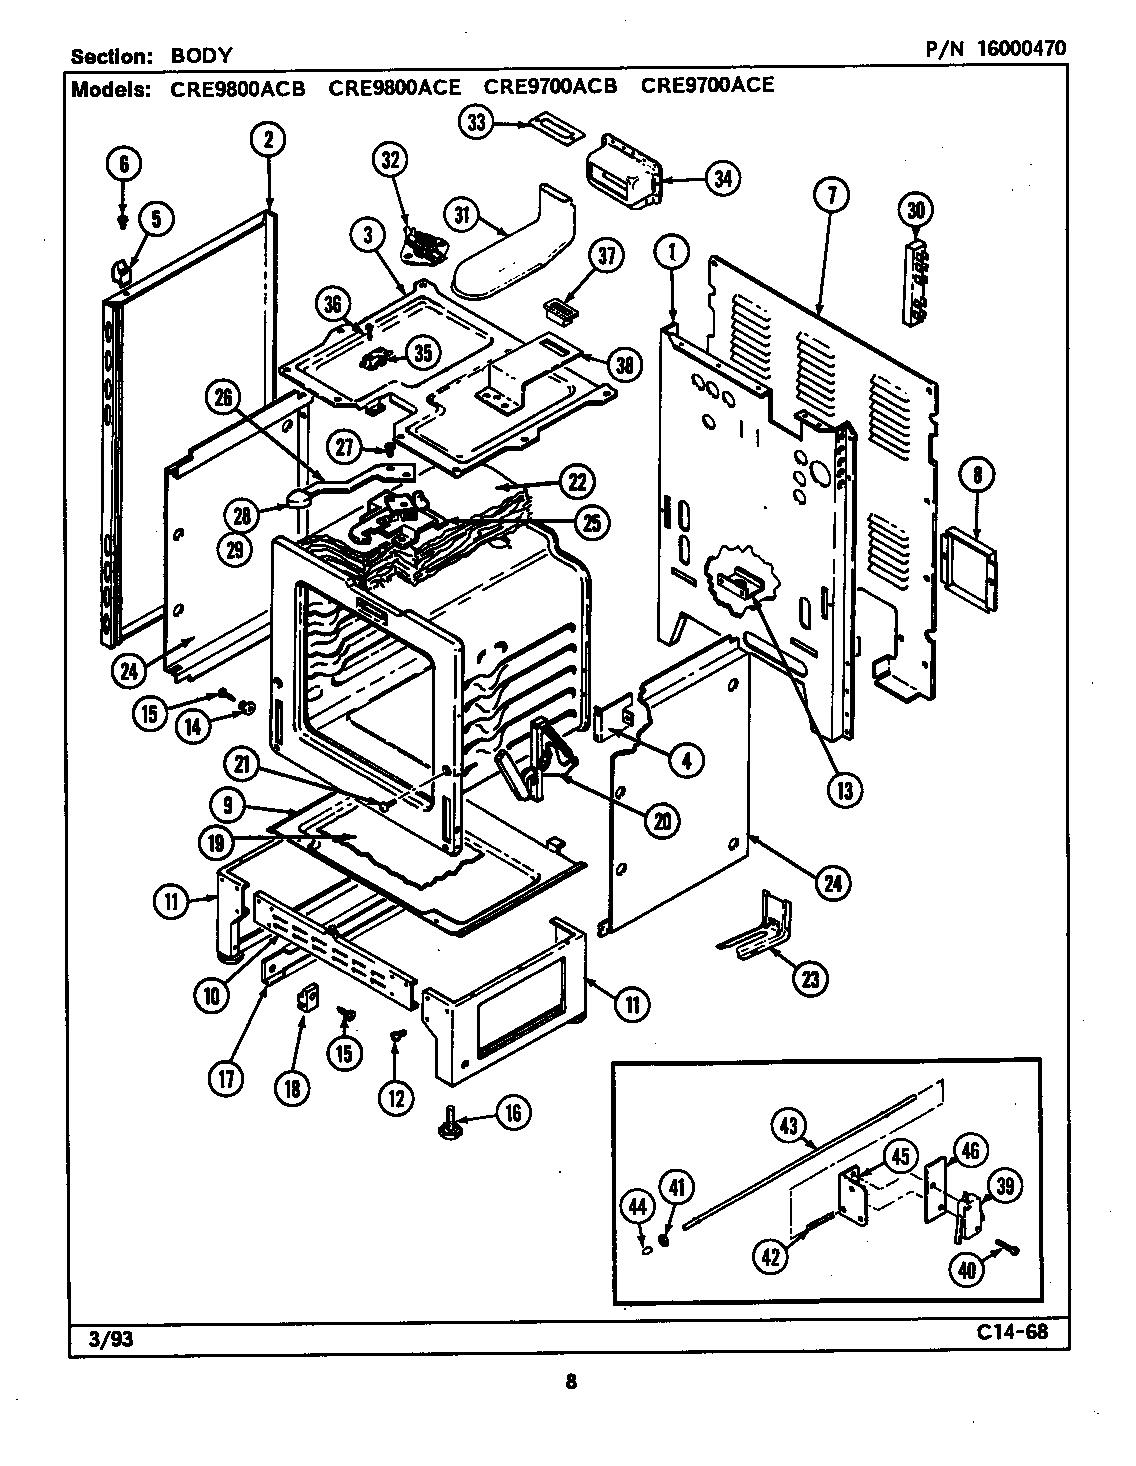 maytag stove wiring diagram